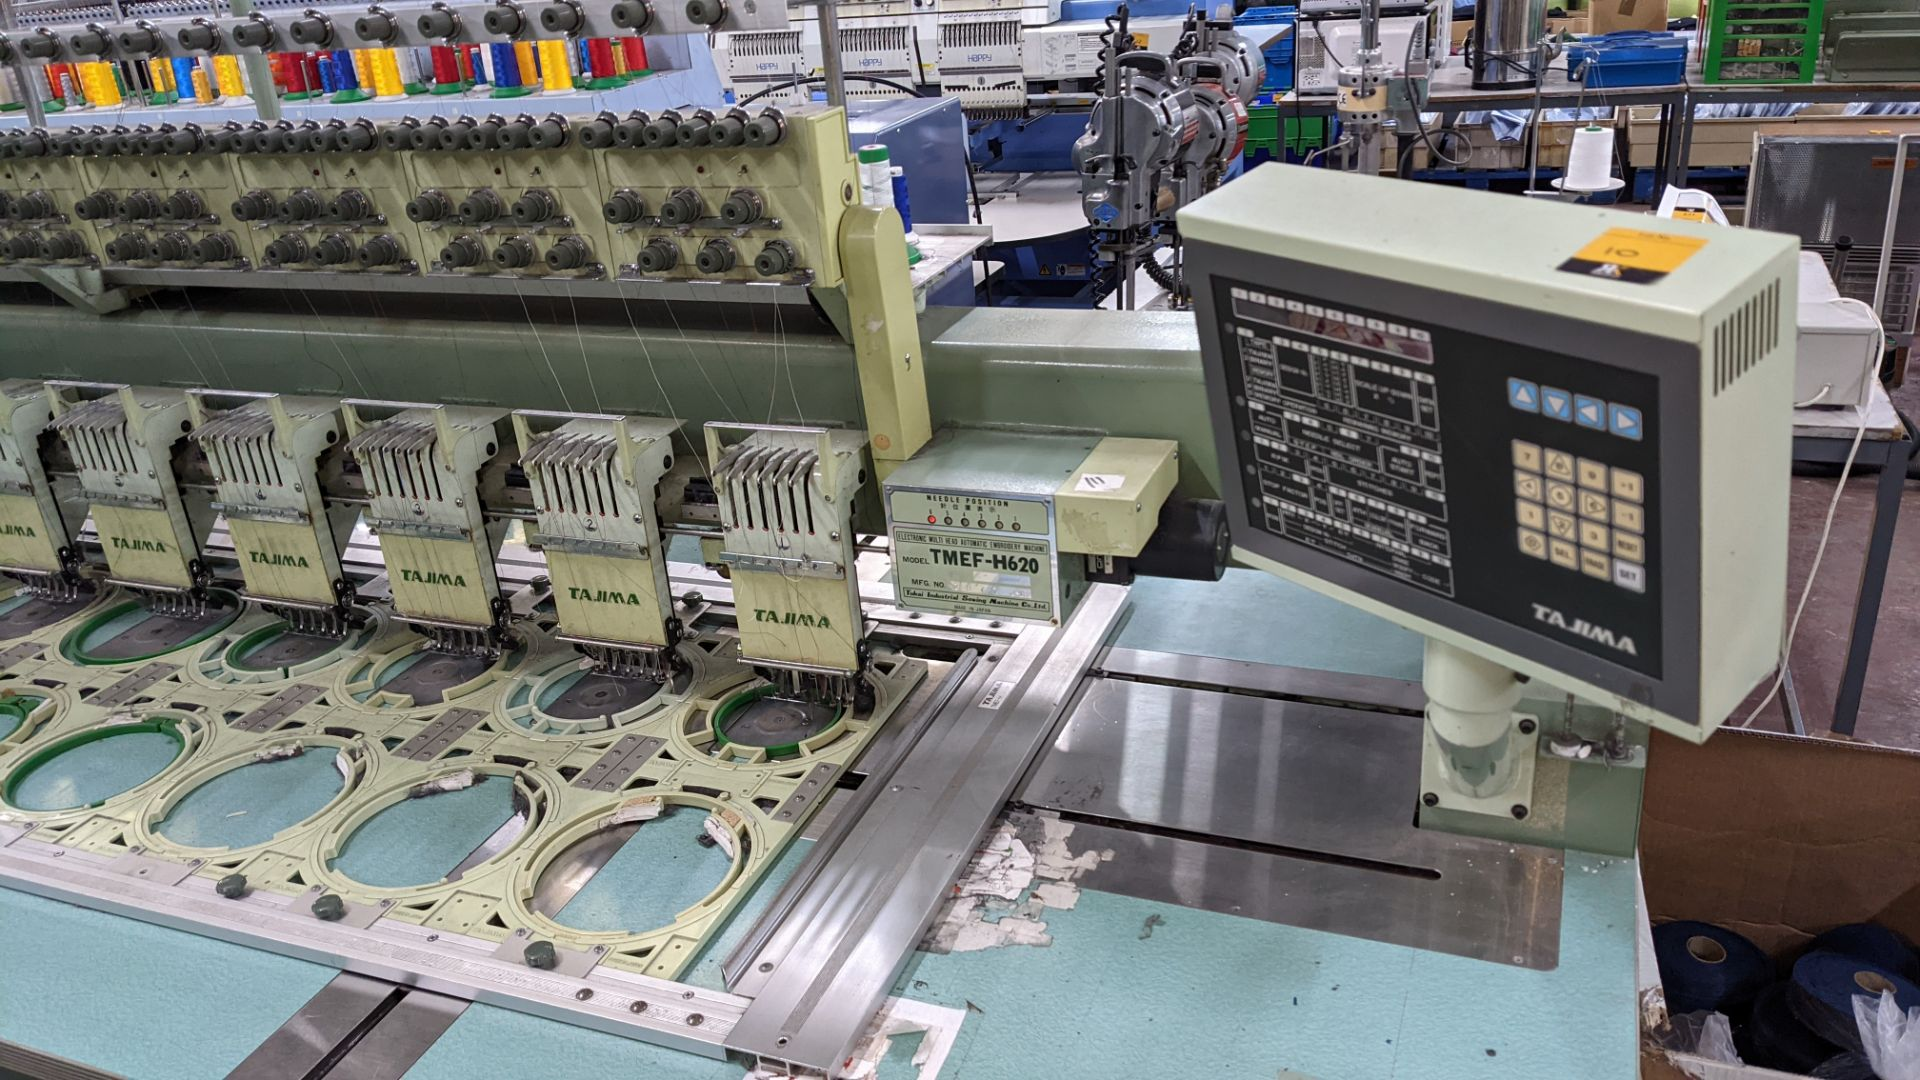 Tokai Tajima electronic 20 head automatic embroidery machine model TMEF-H620 - Image 3 of 25